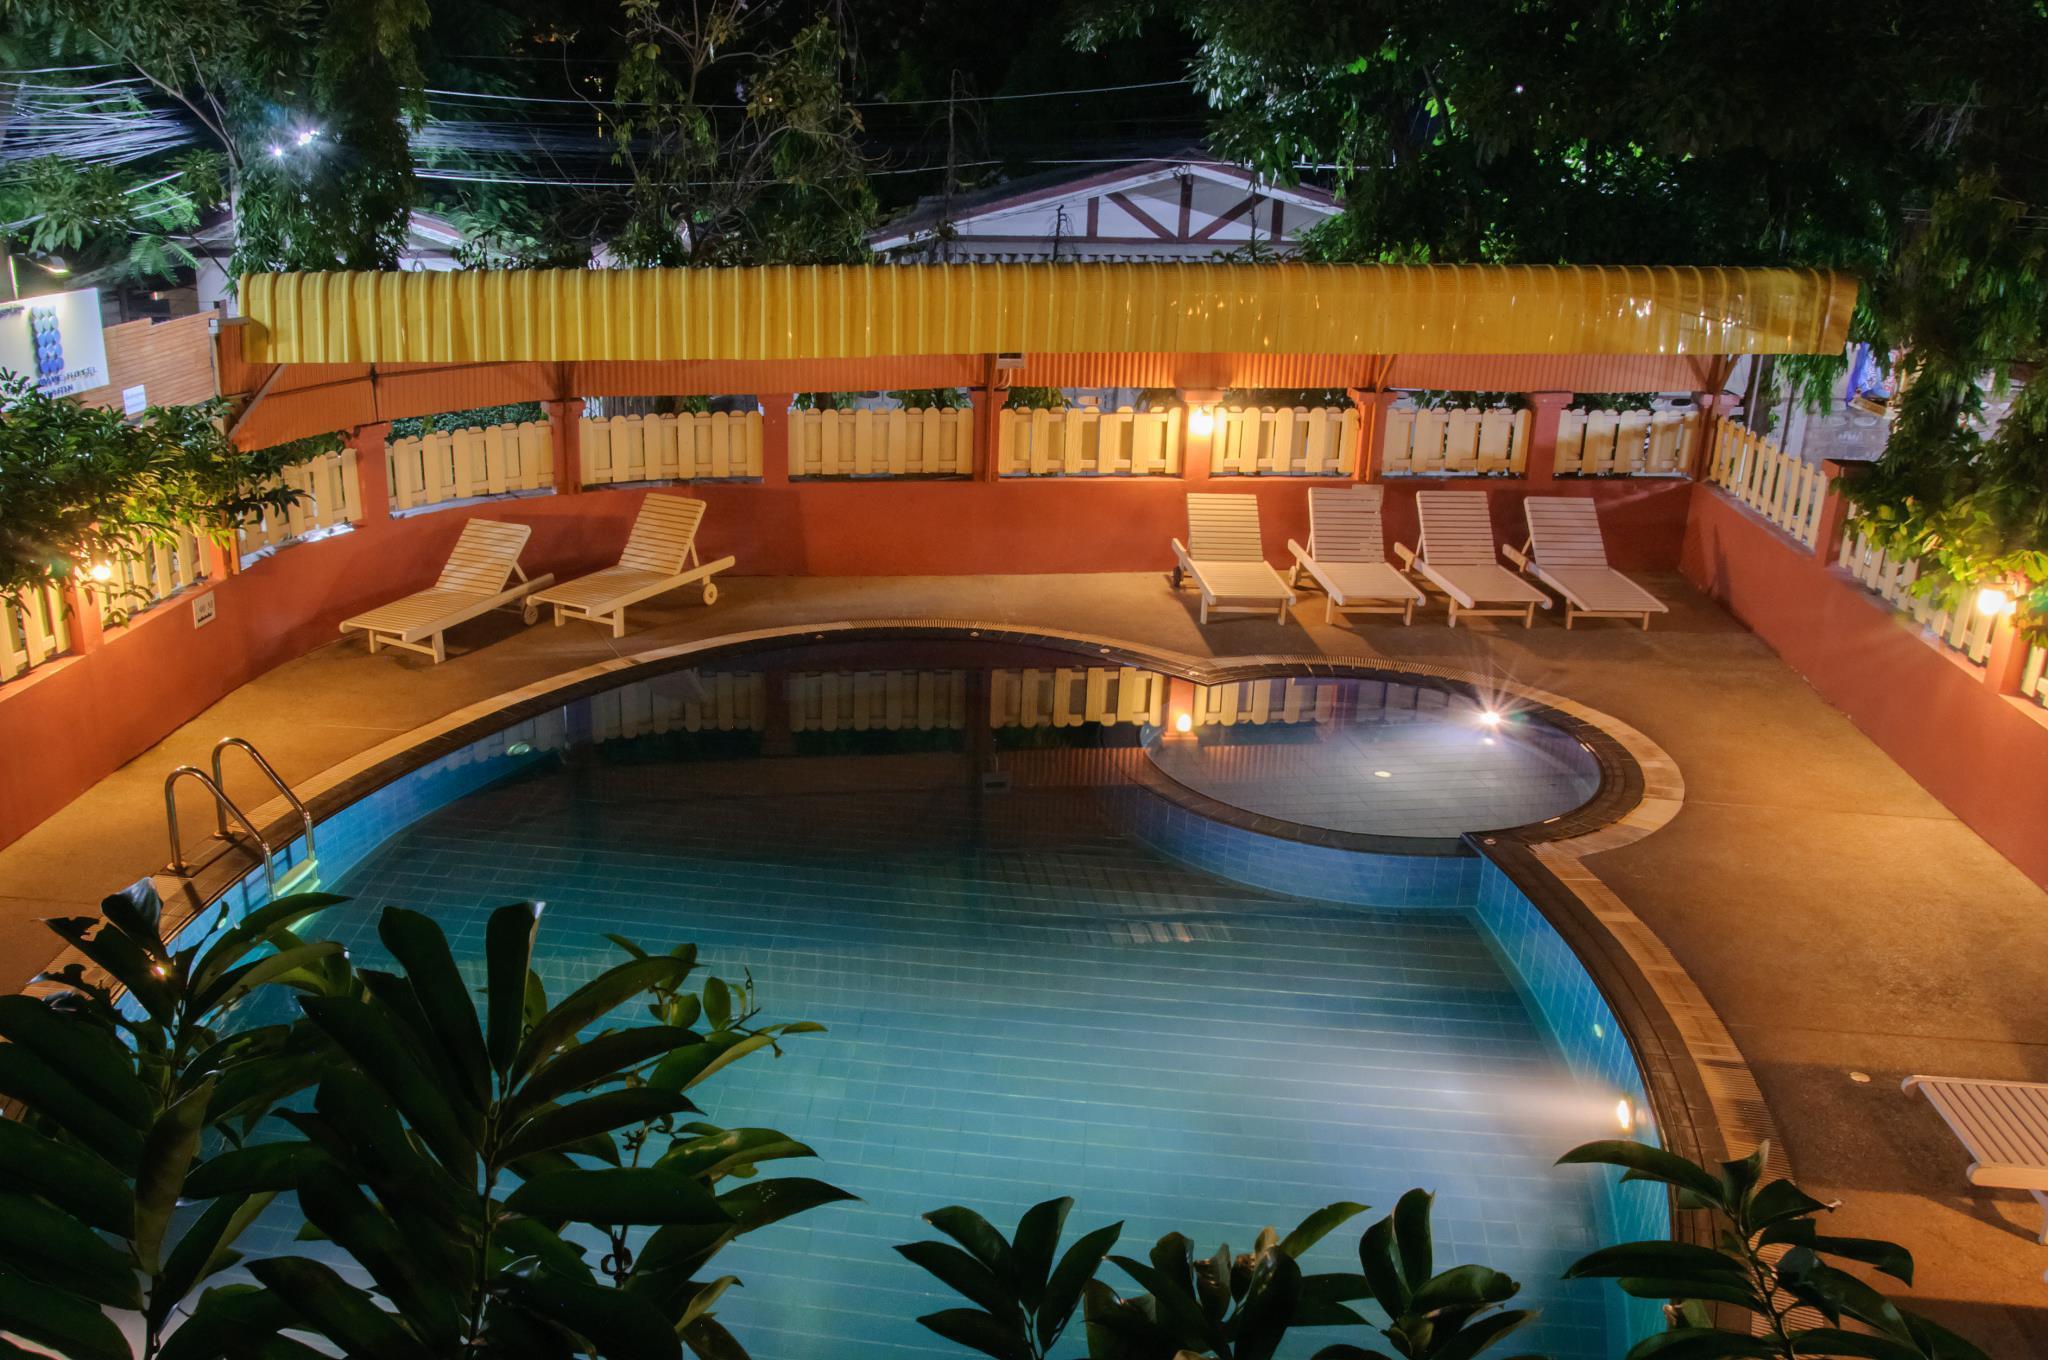 Takiab Beach Resort ตะเกียบ บีช รีสอร์ท